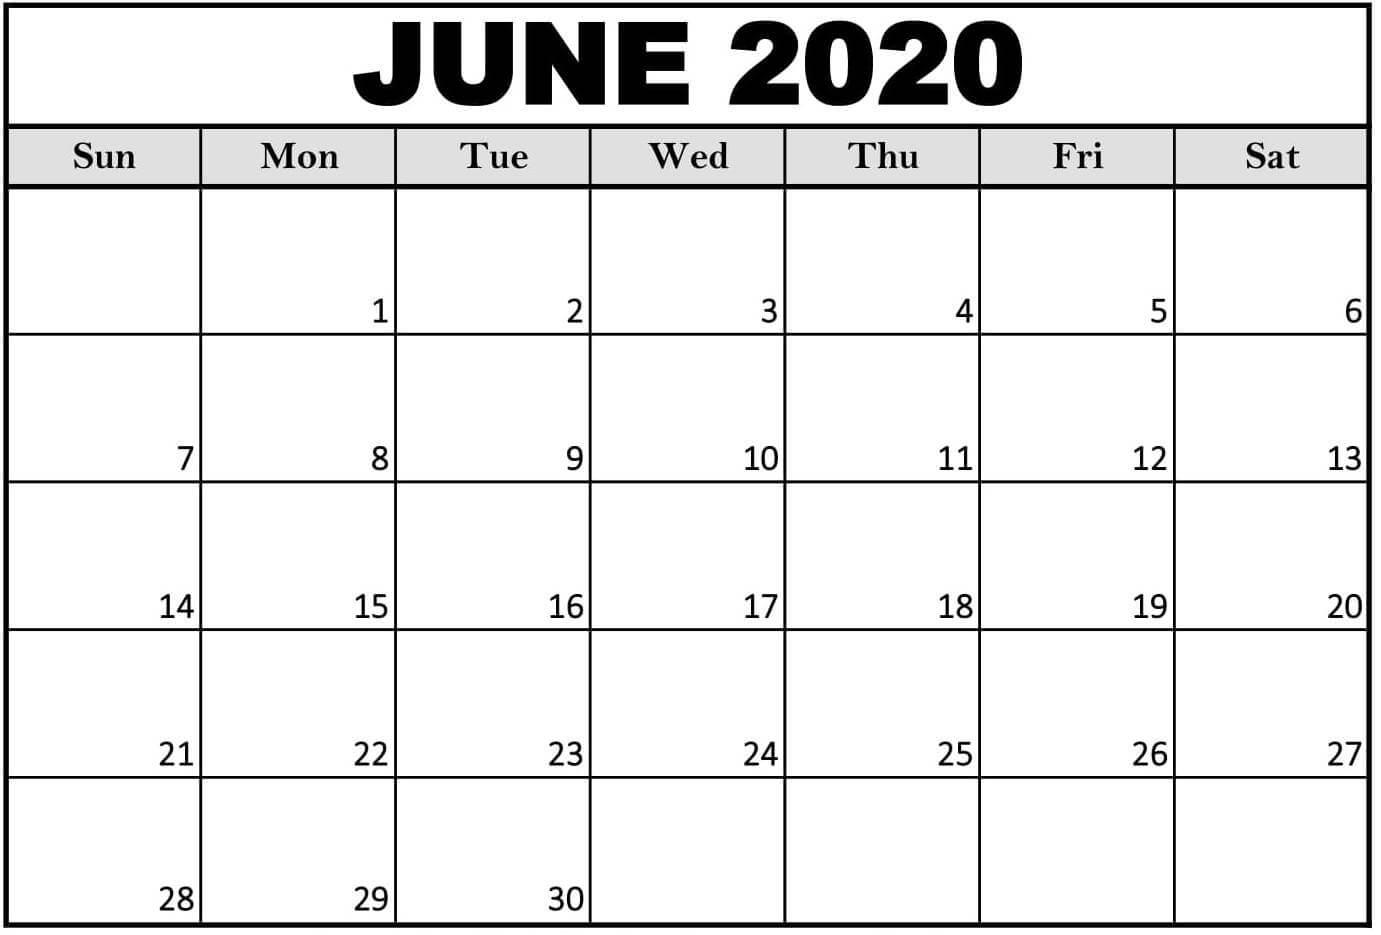 Free Blank June 2020 Calendar